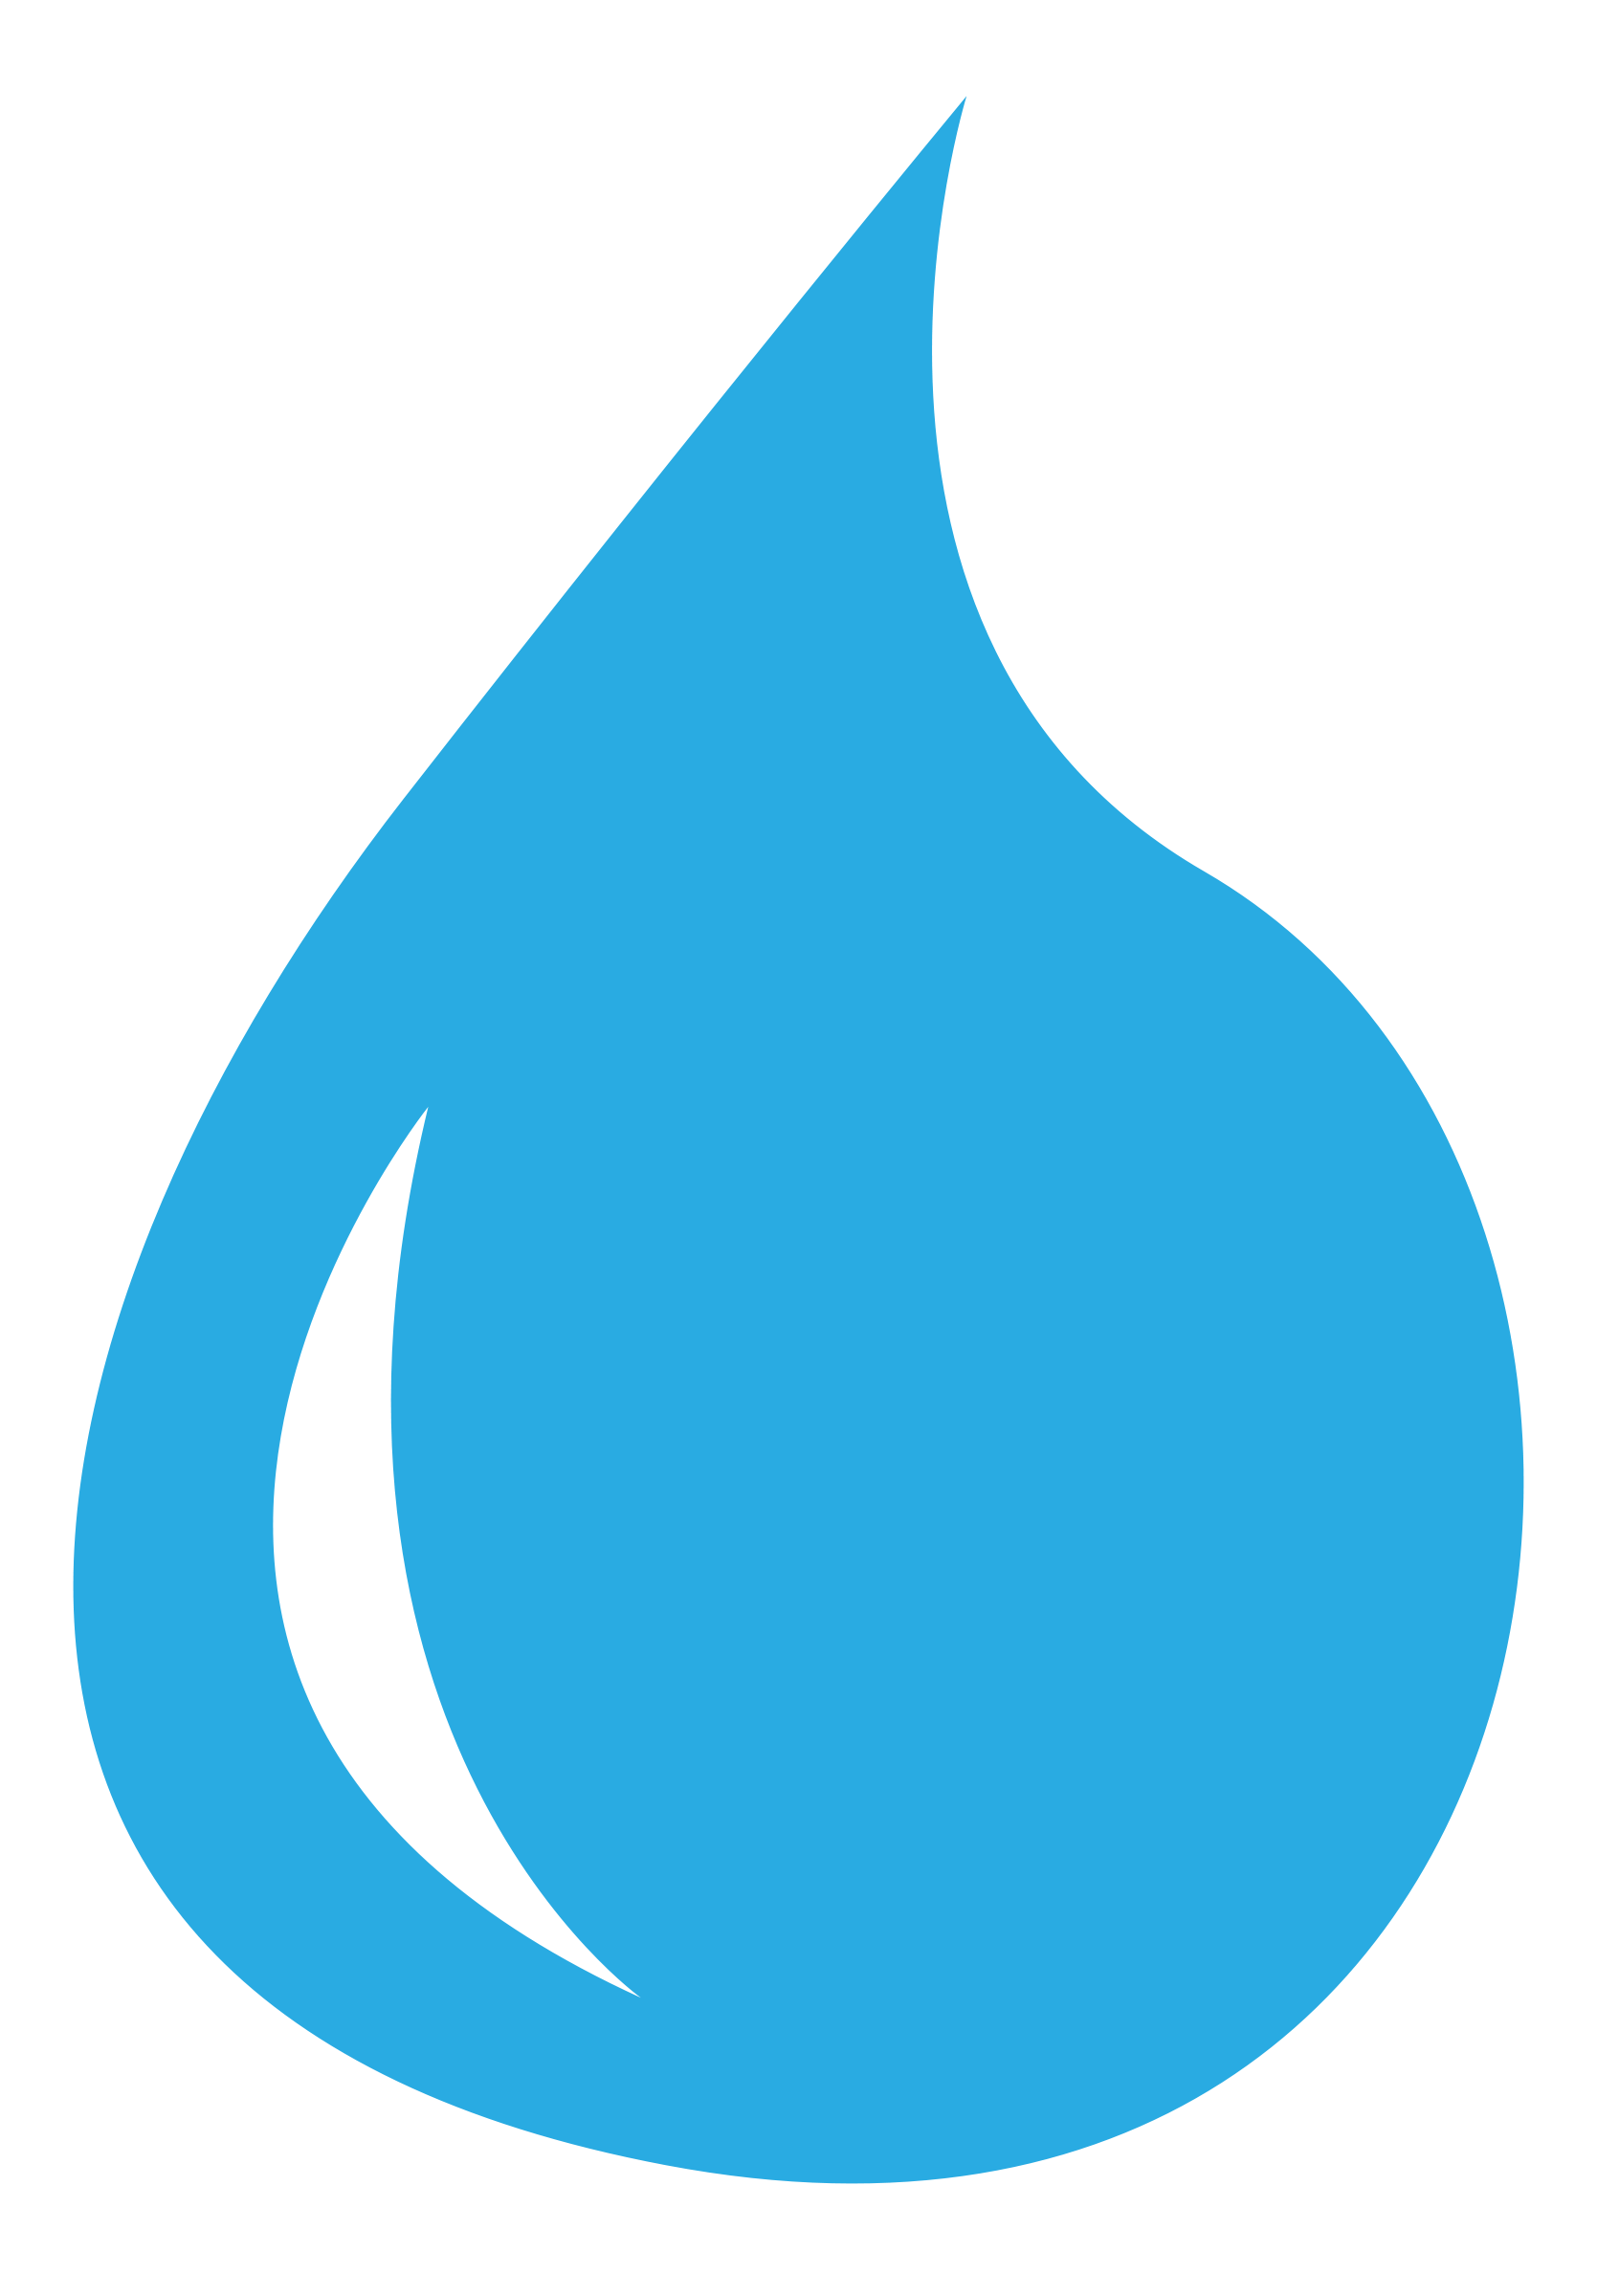 Cartoon Water Droplets - ClipArt Best